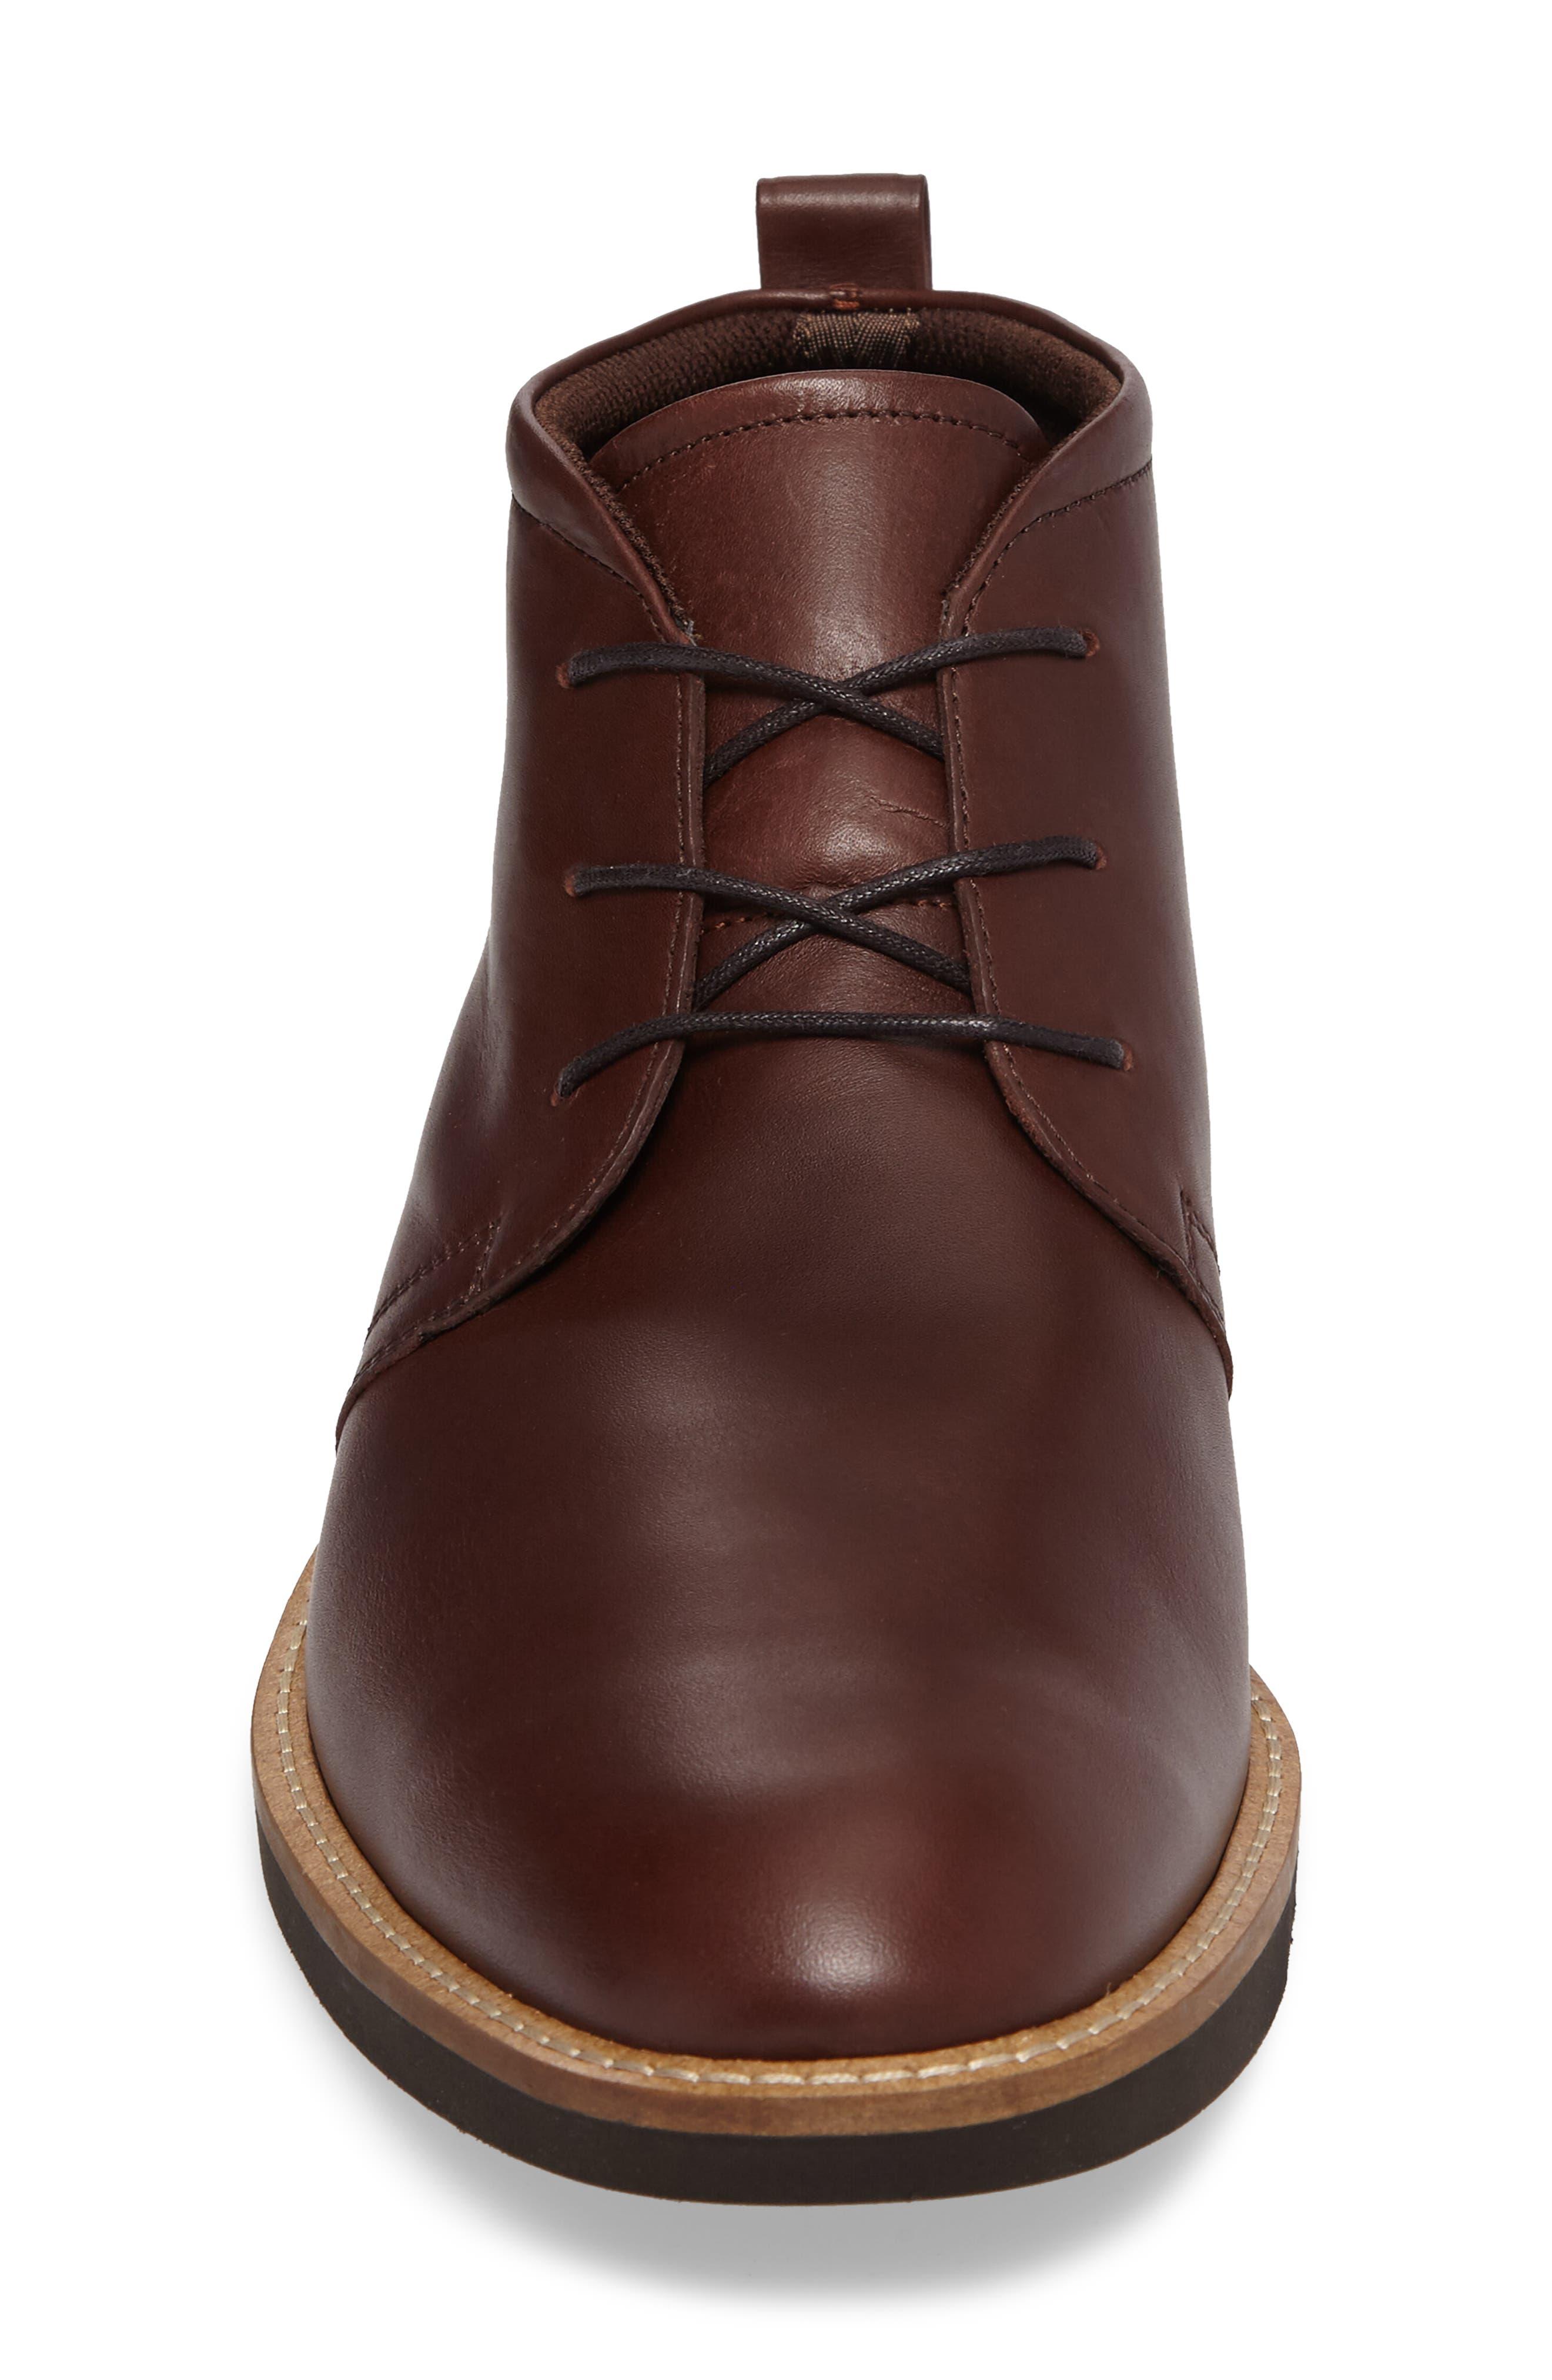 Biarritz Chukka Boot,                             Alternate thumbnail 4, color,                             Rust Leather